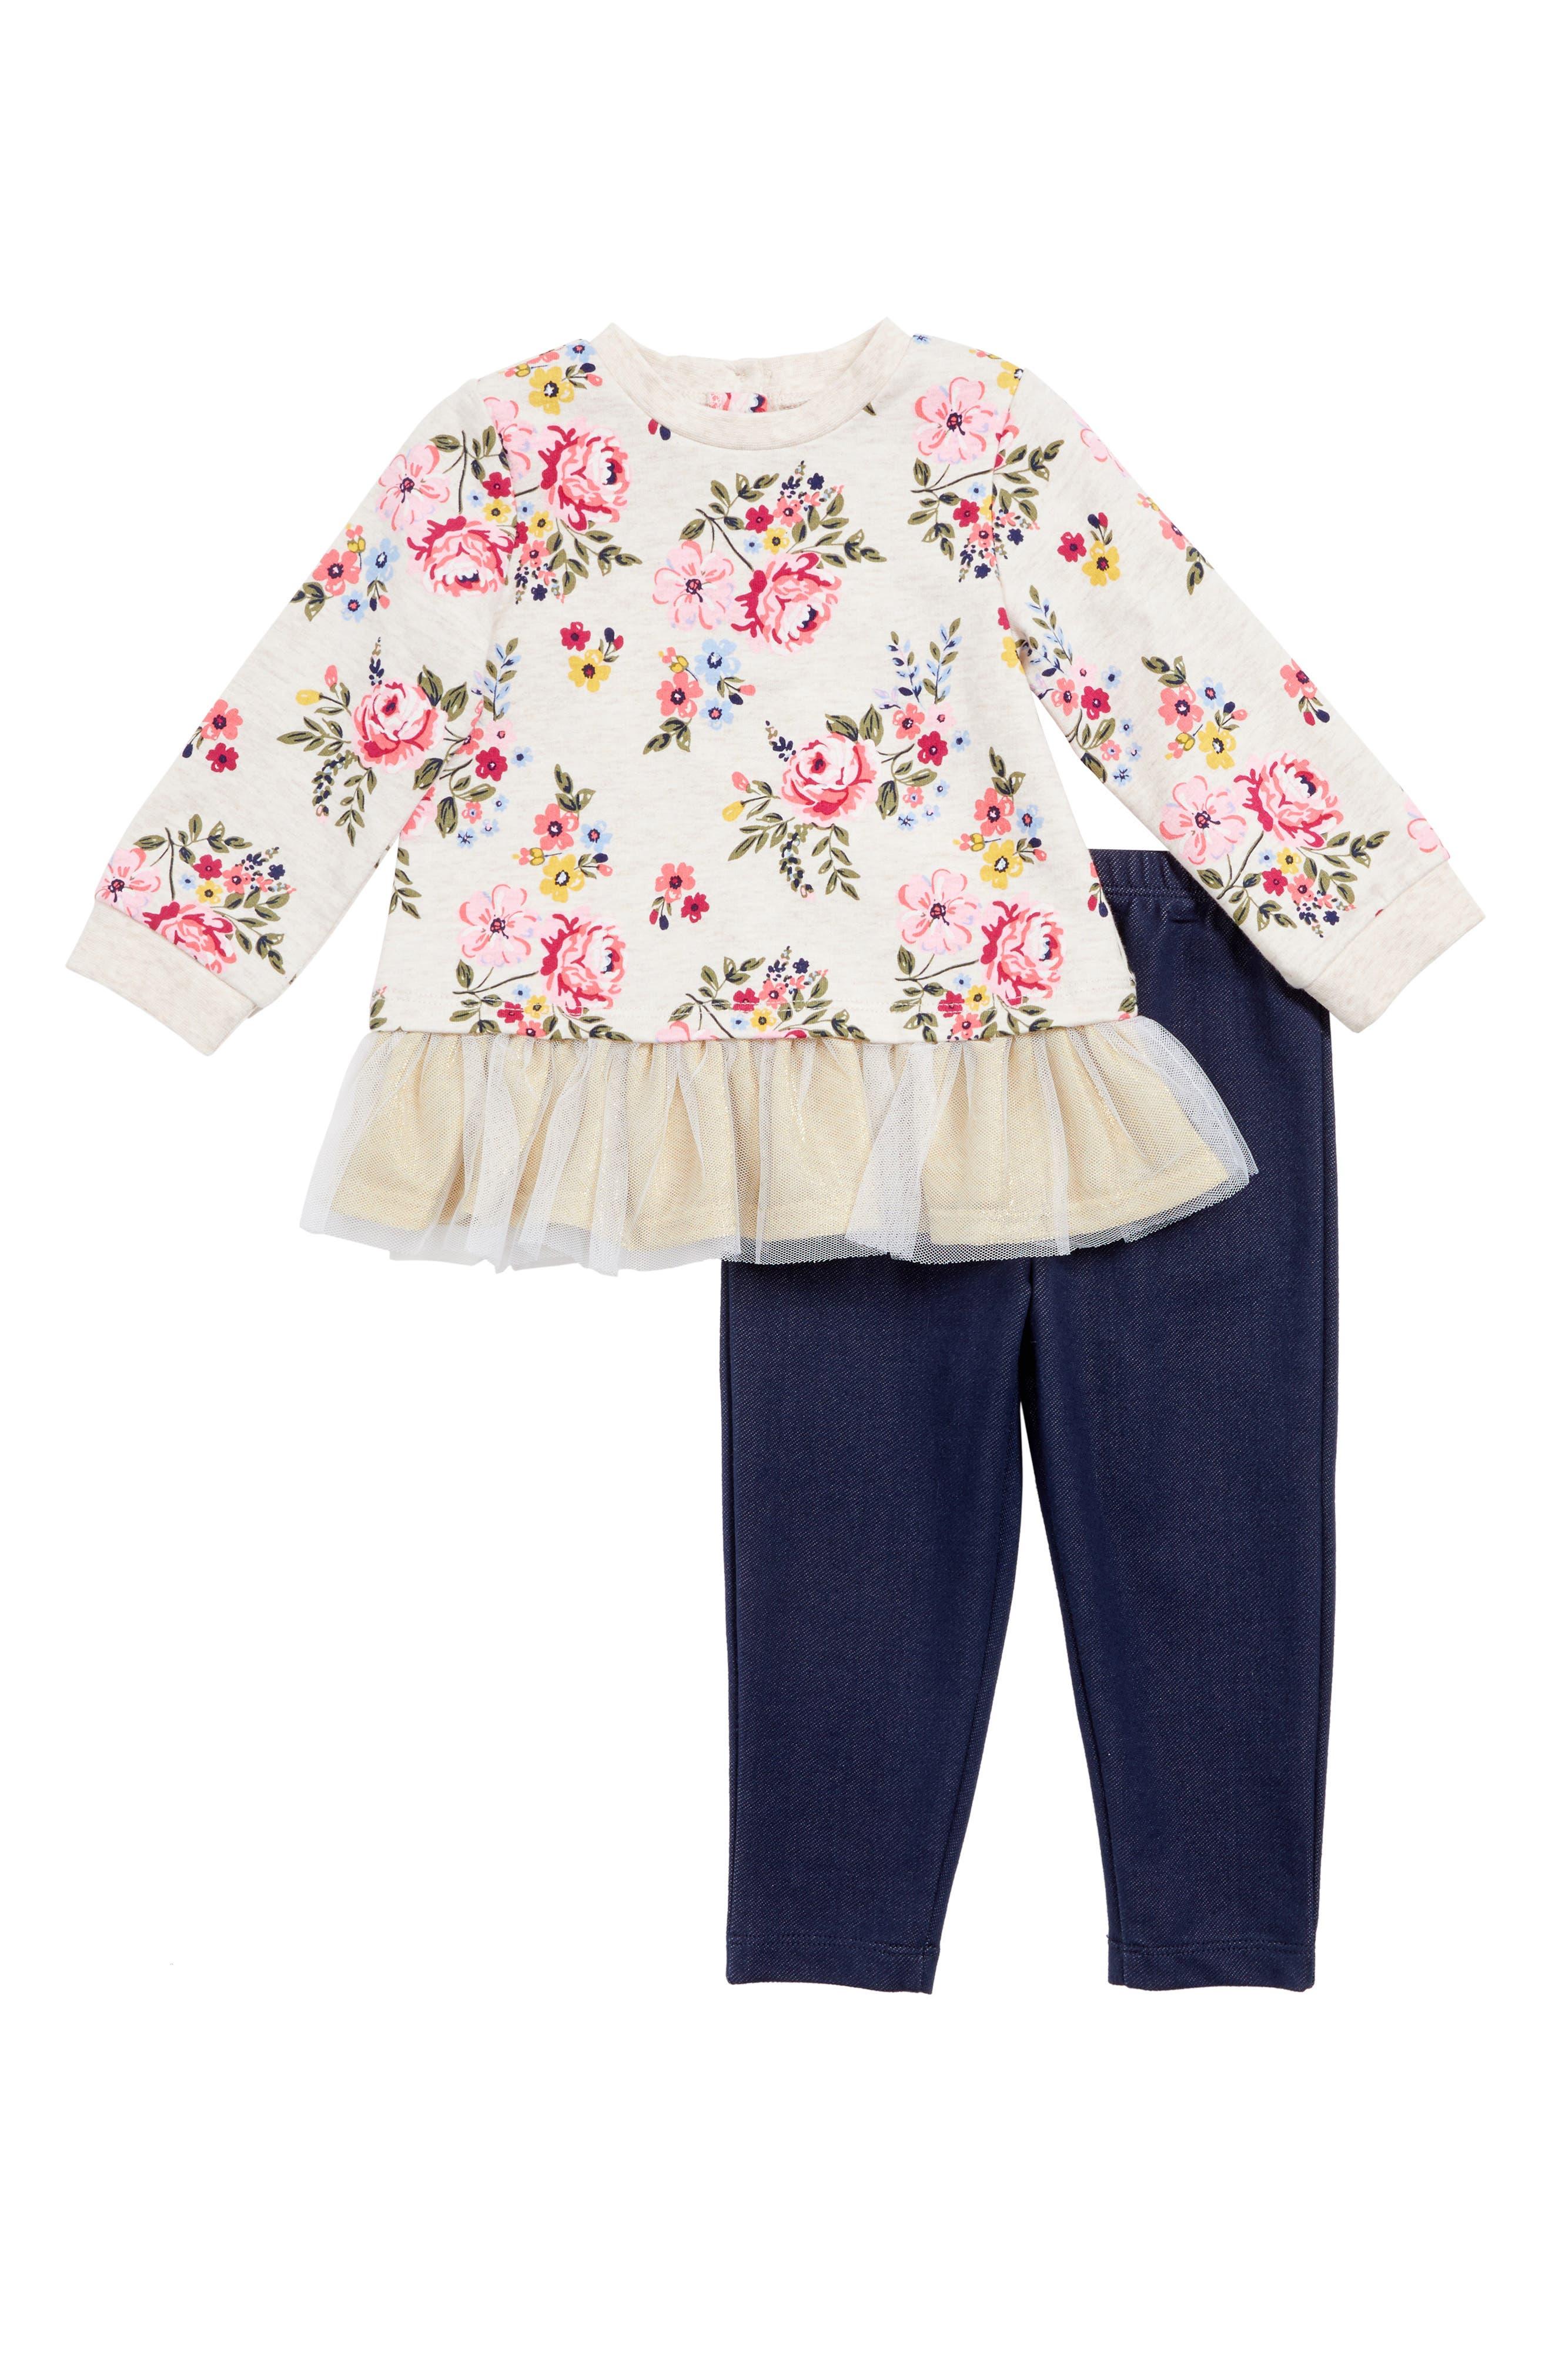 Little Me Floral Top & Leggings Set (Baby Girls)